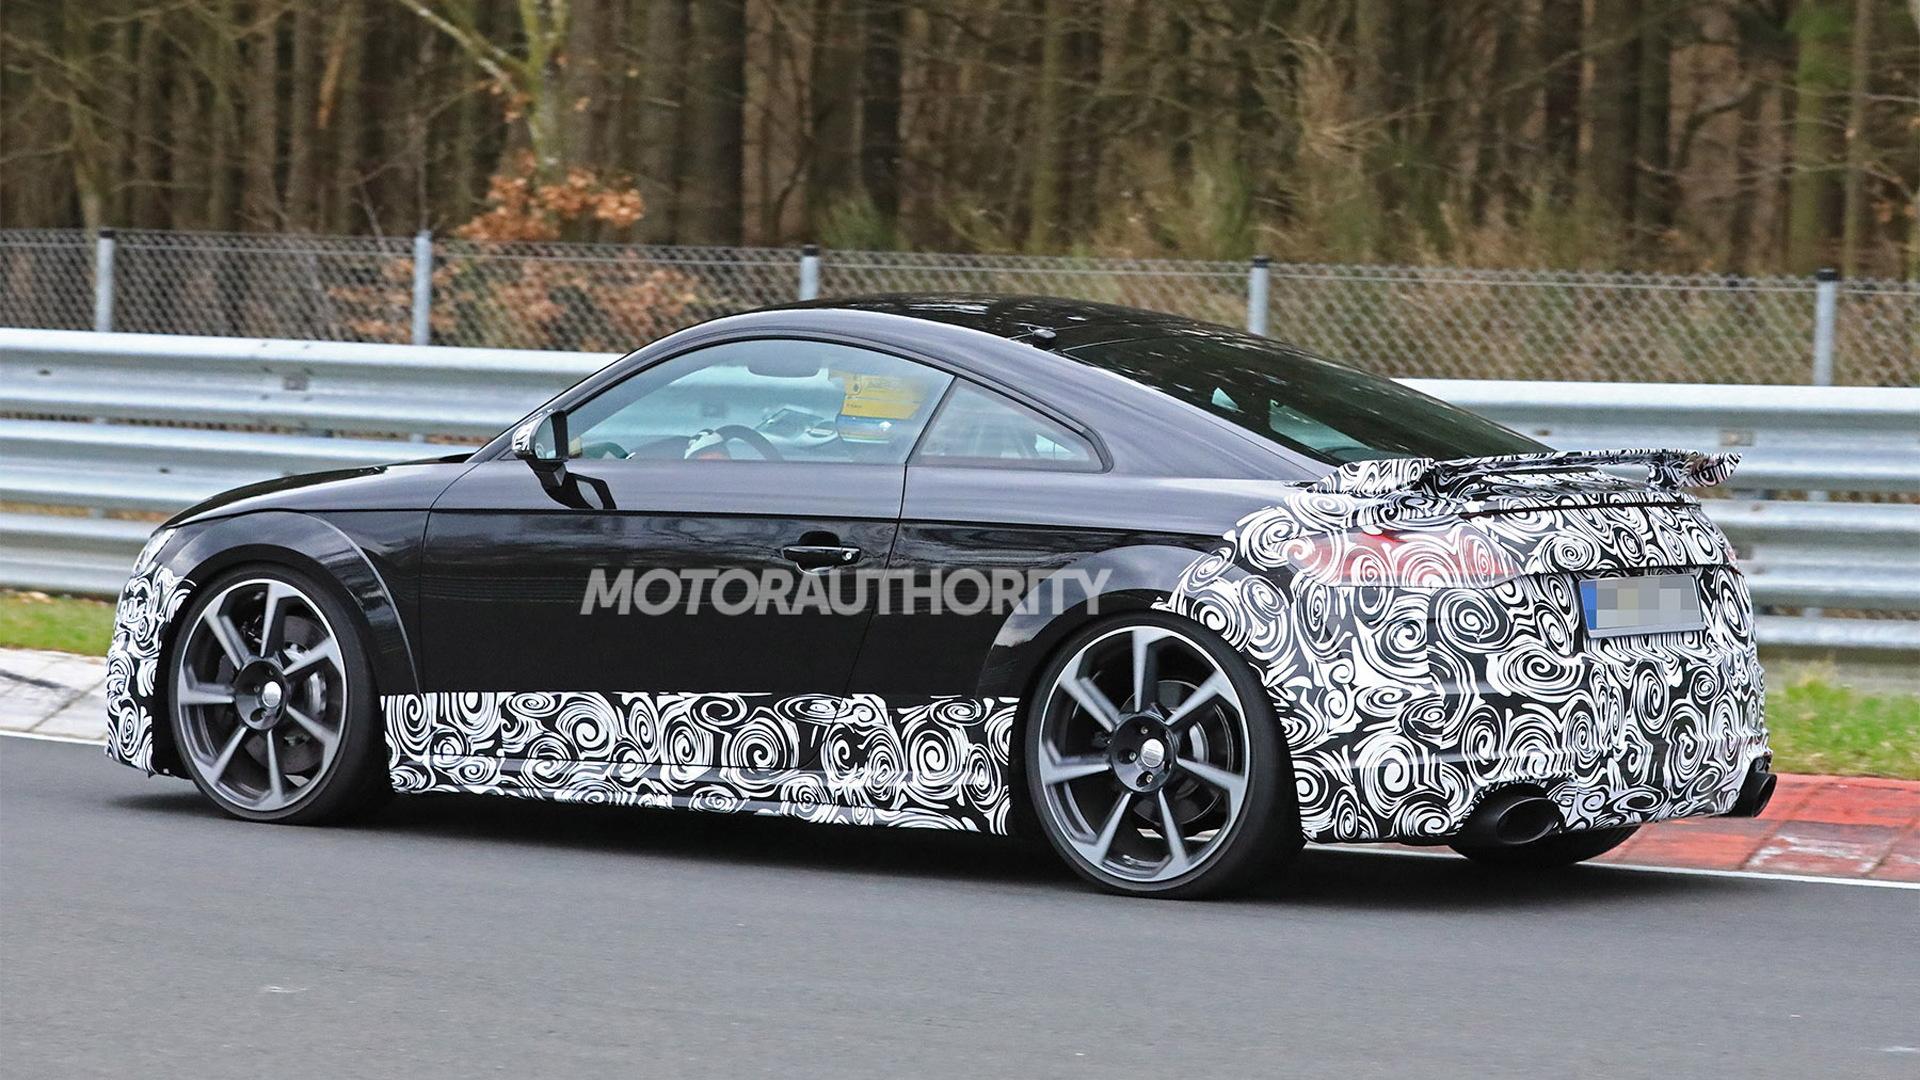 2020 Audi TT RS facelift spy shots - Image via S. Baldauf/SB-Medien